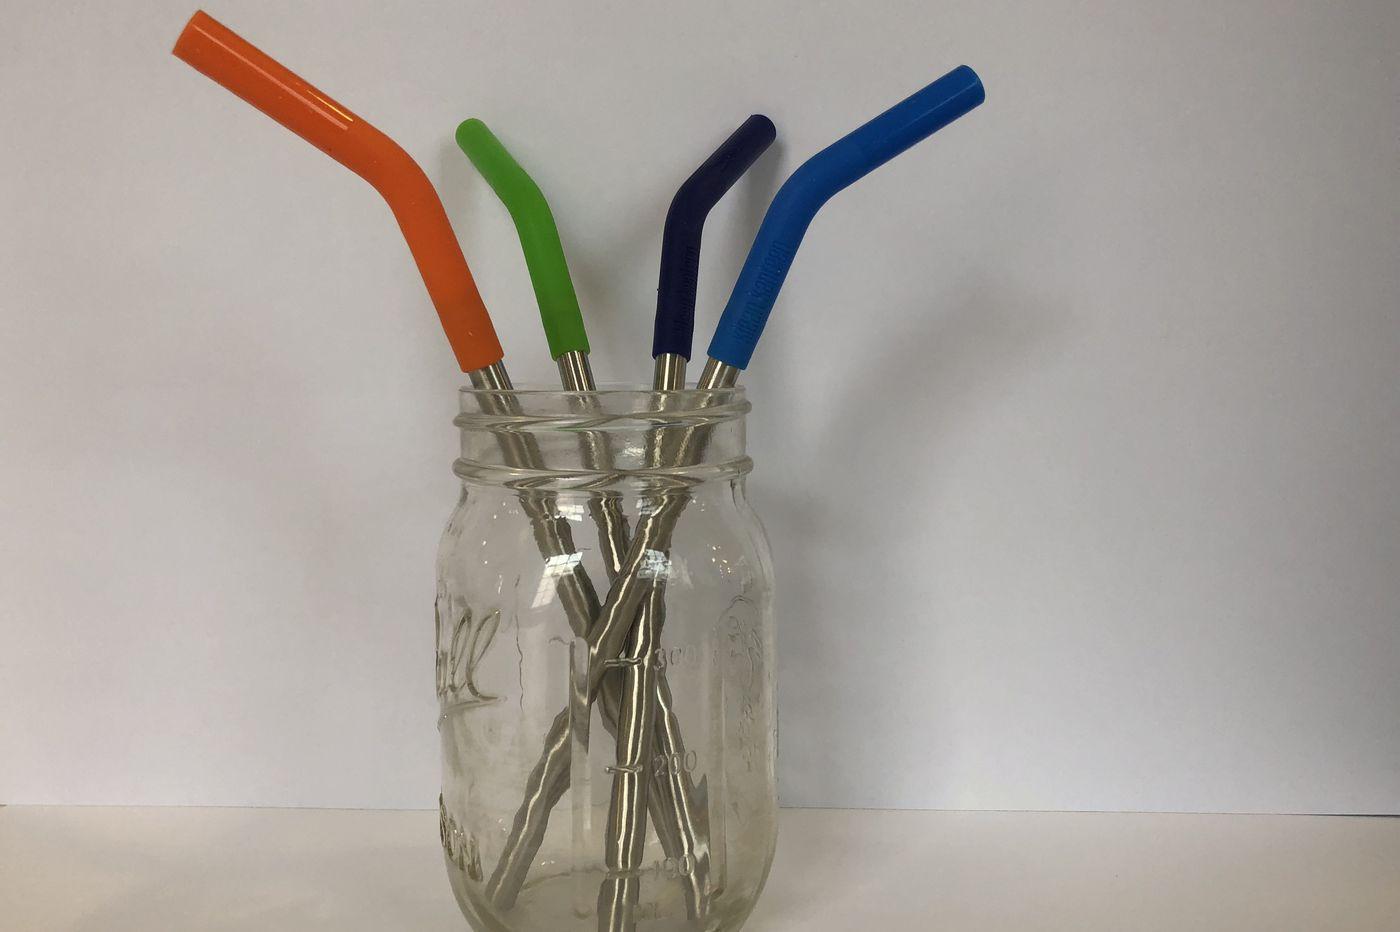 Avoiding plastic straws? Try this metal version to ease environmental guilt